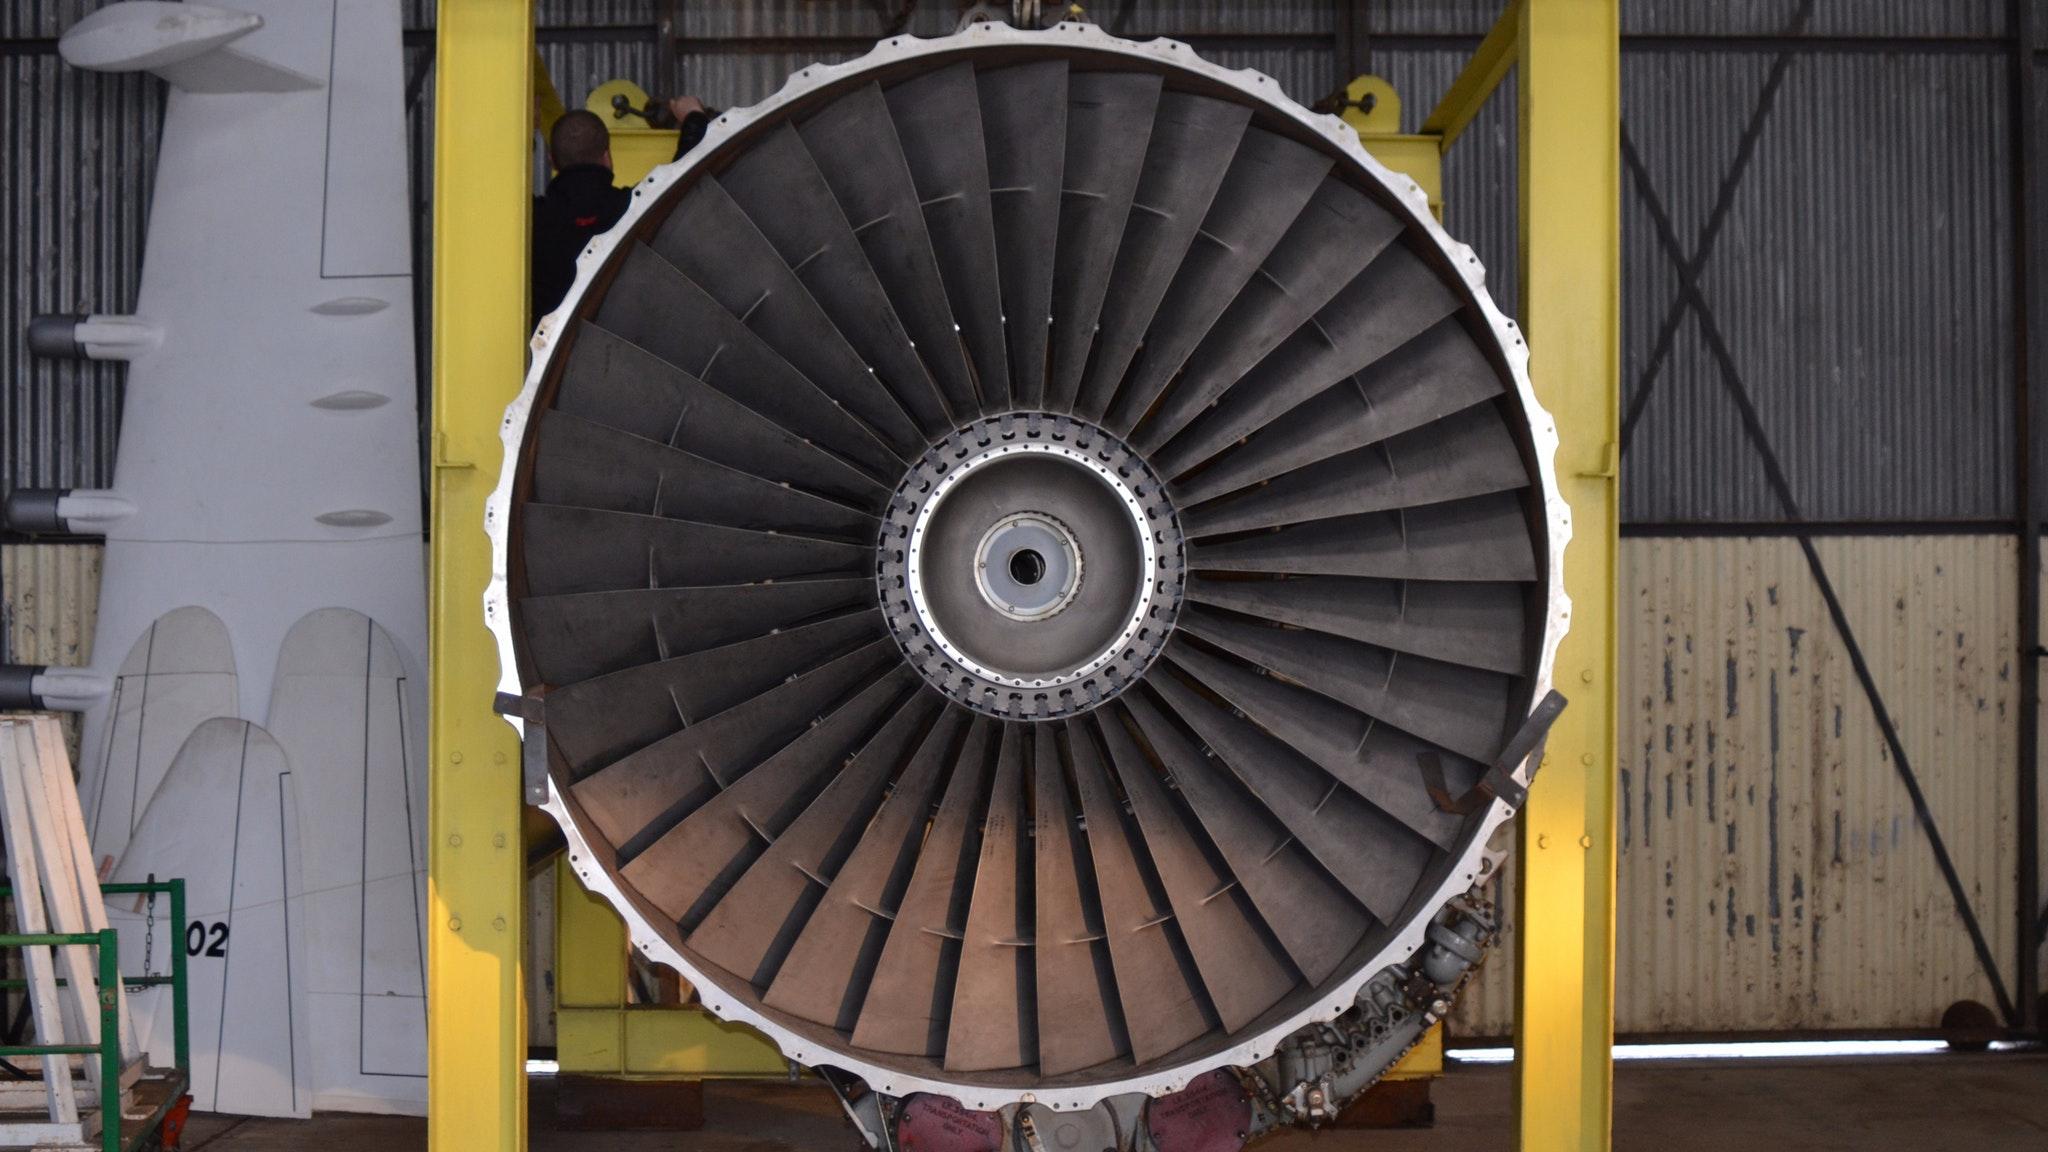 747 engine located in hangar 8